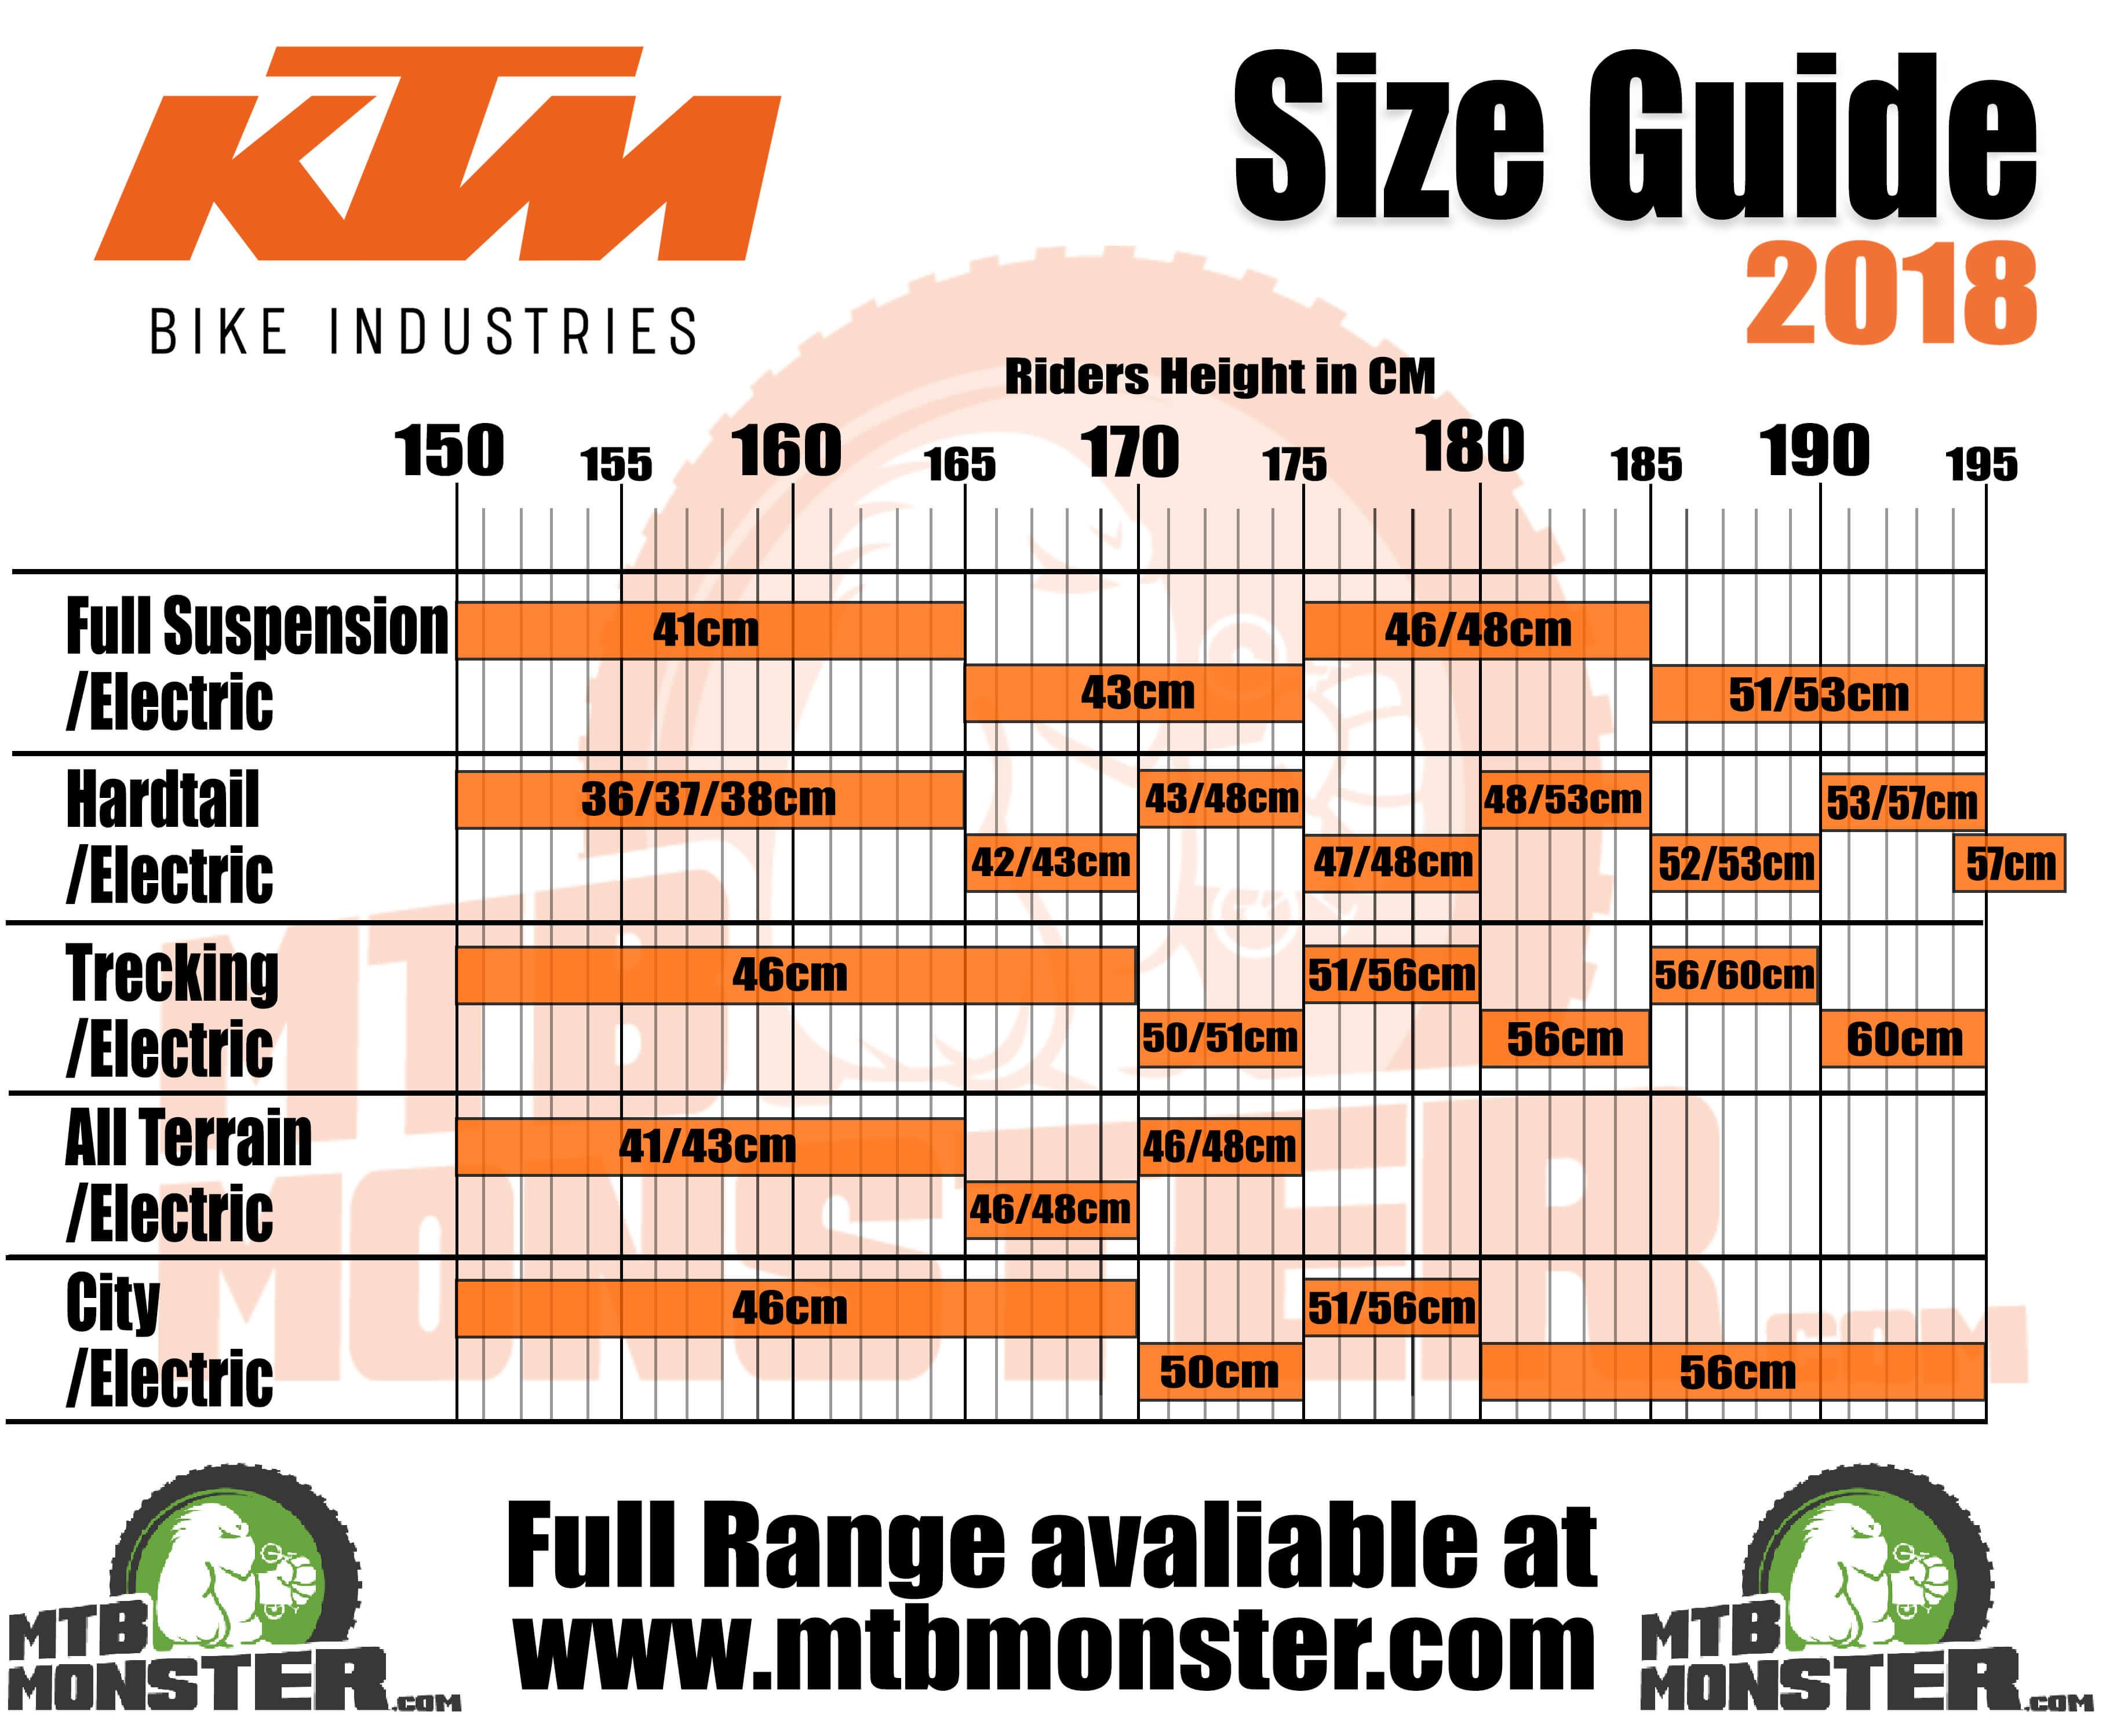 KTM Bikes Size Guide, KTM Bikes Sizing Chart 2018